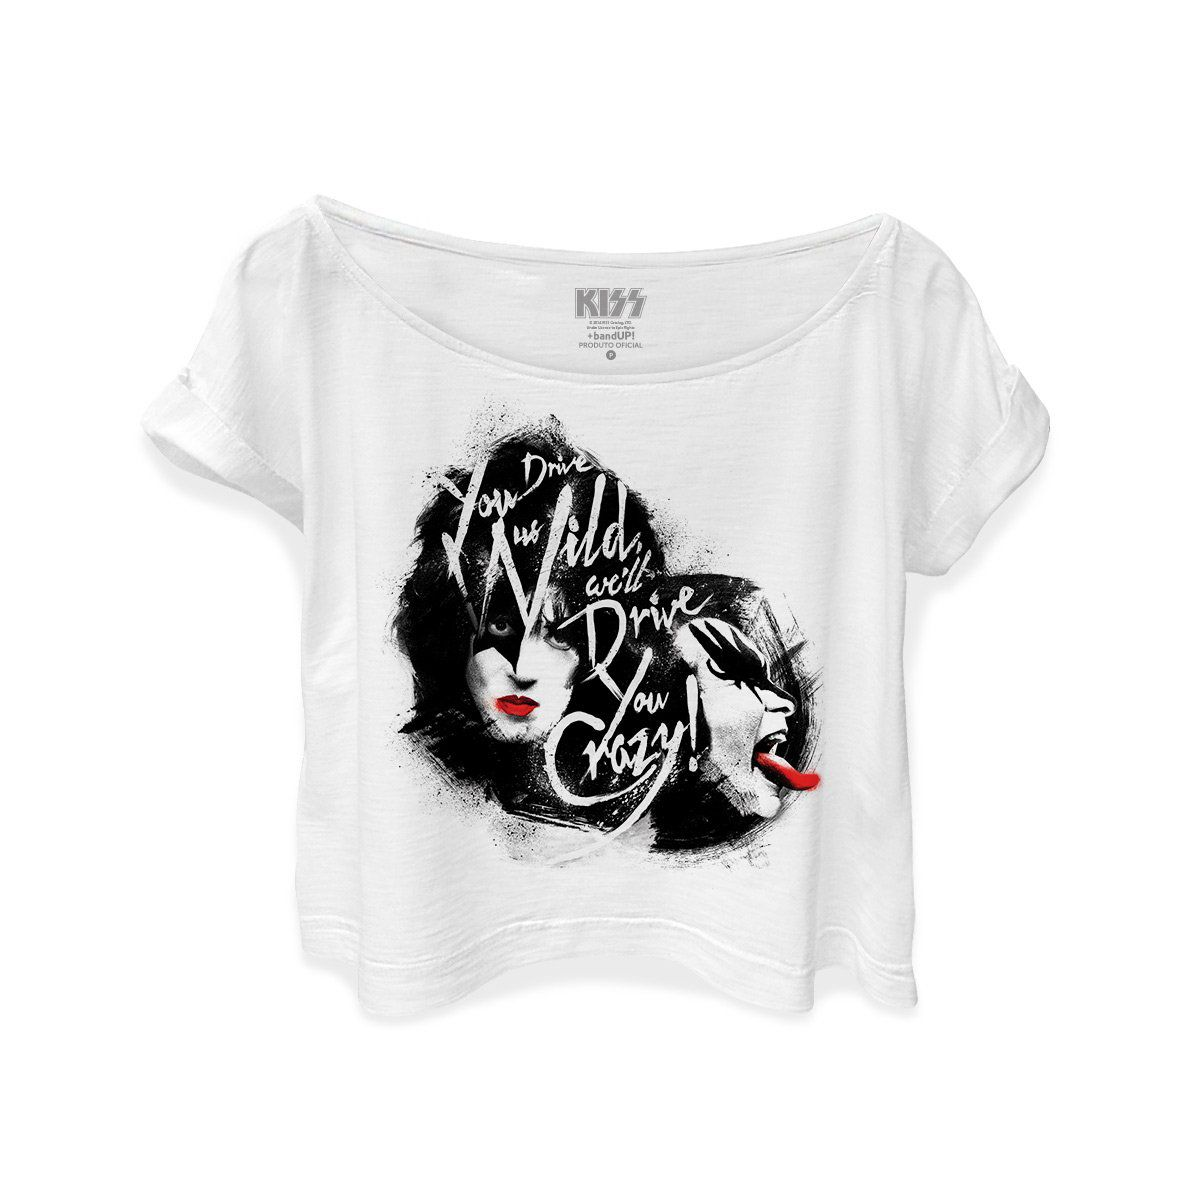 T-shirt Premium Feminina Kiss Dressed To Kill  - bandUP Store Marketplace